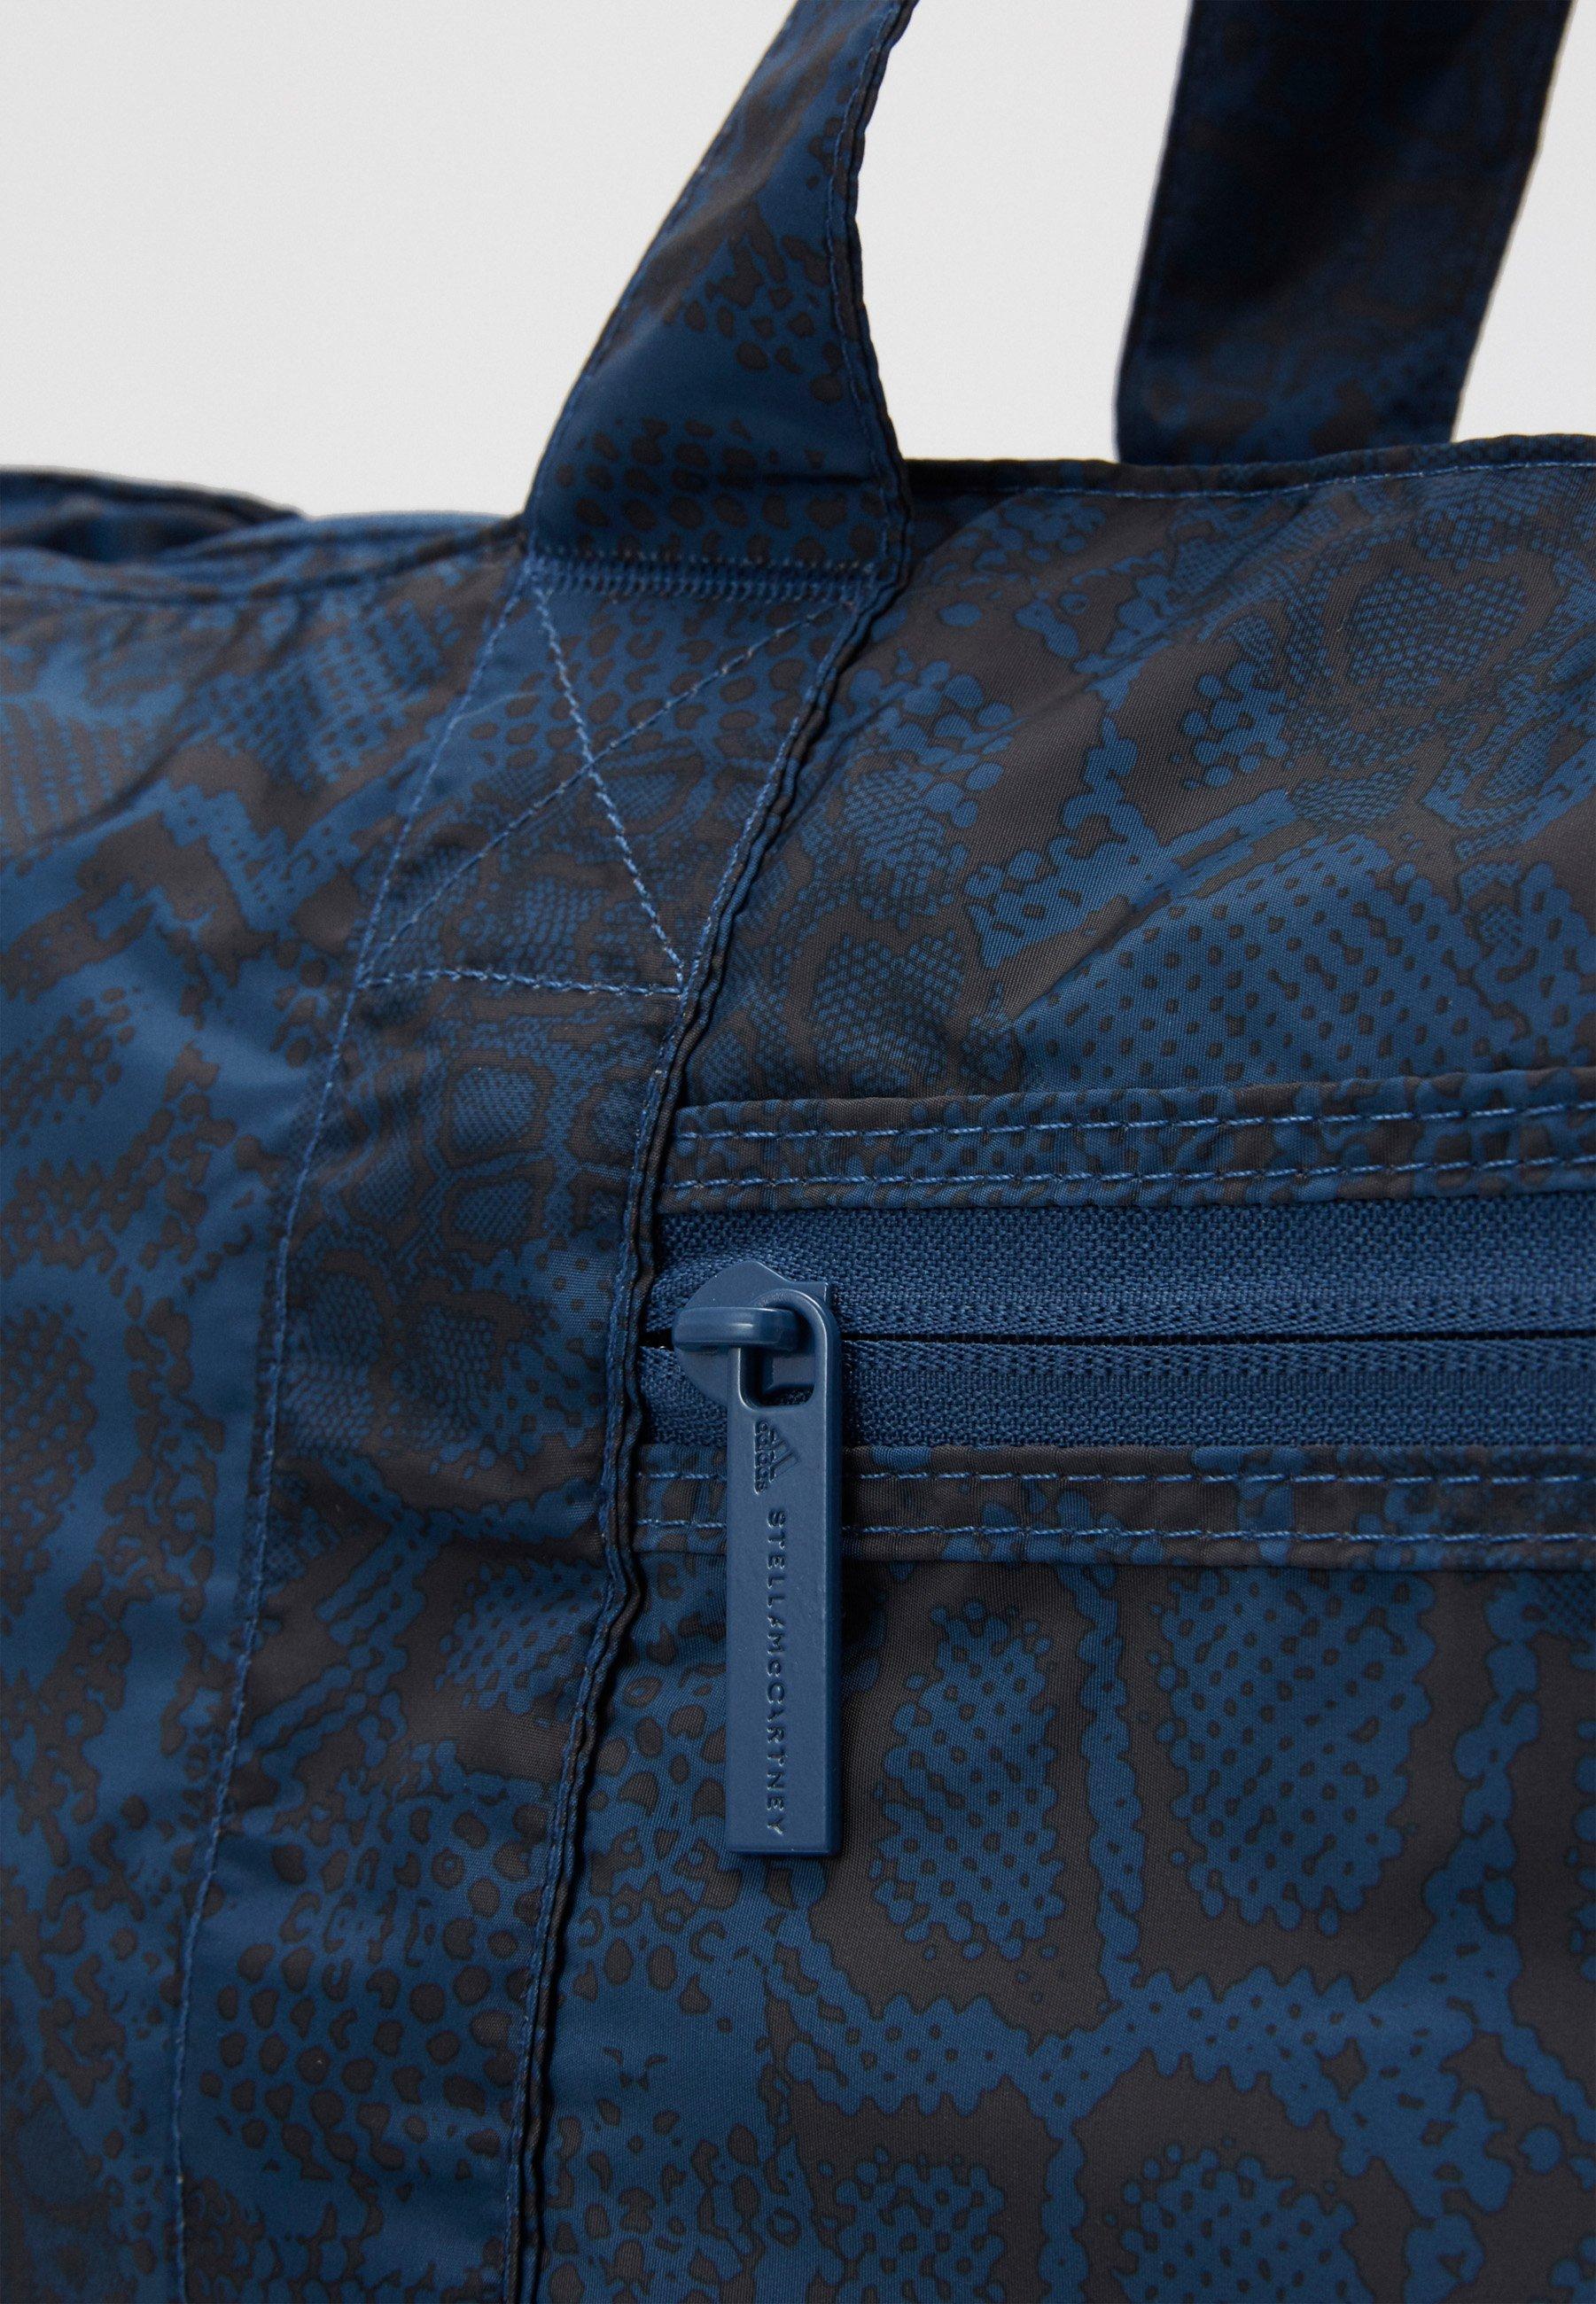 Adidas By Stella Mccartney Large Tote - Sports Bag Blue/black/white